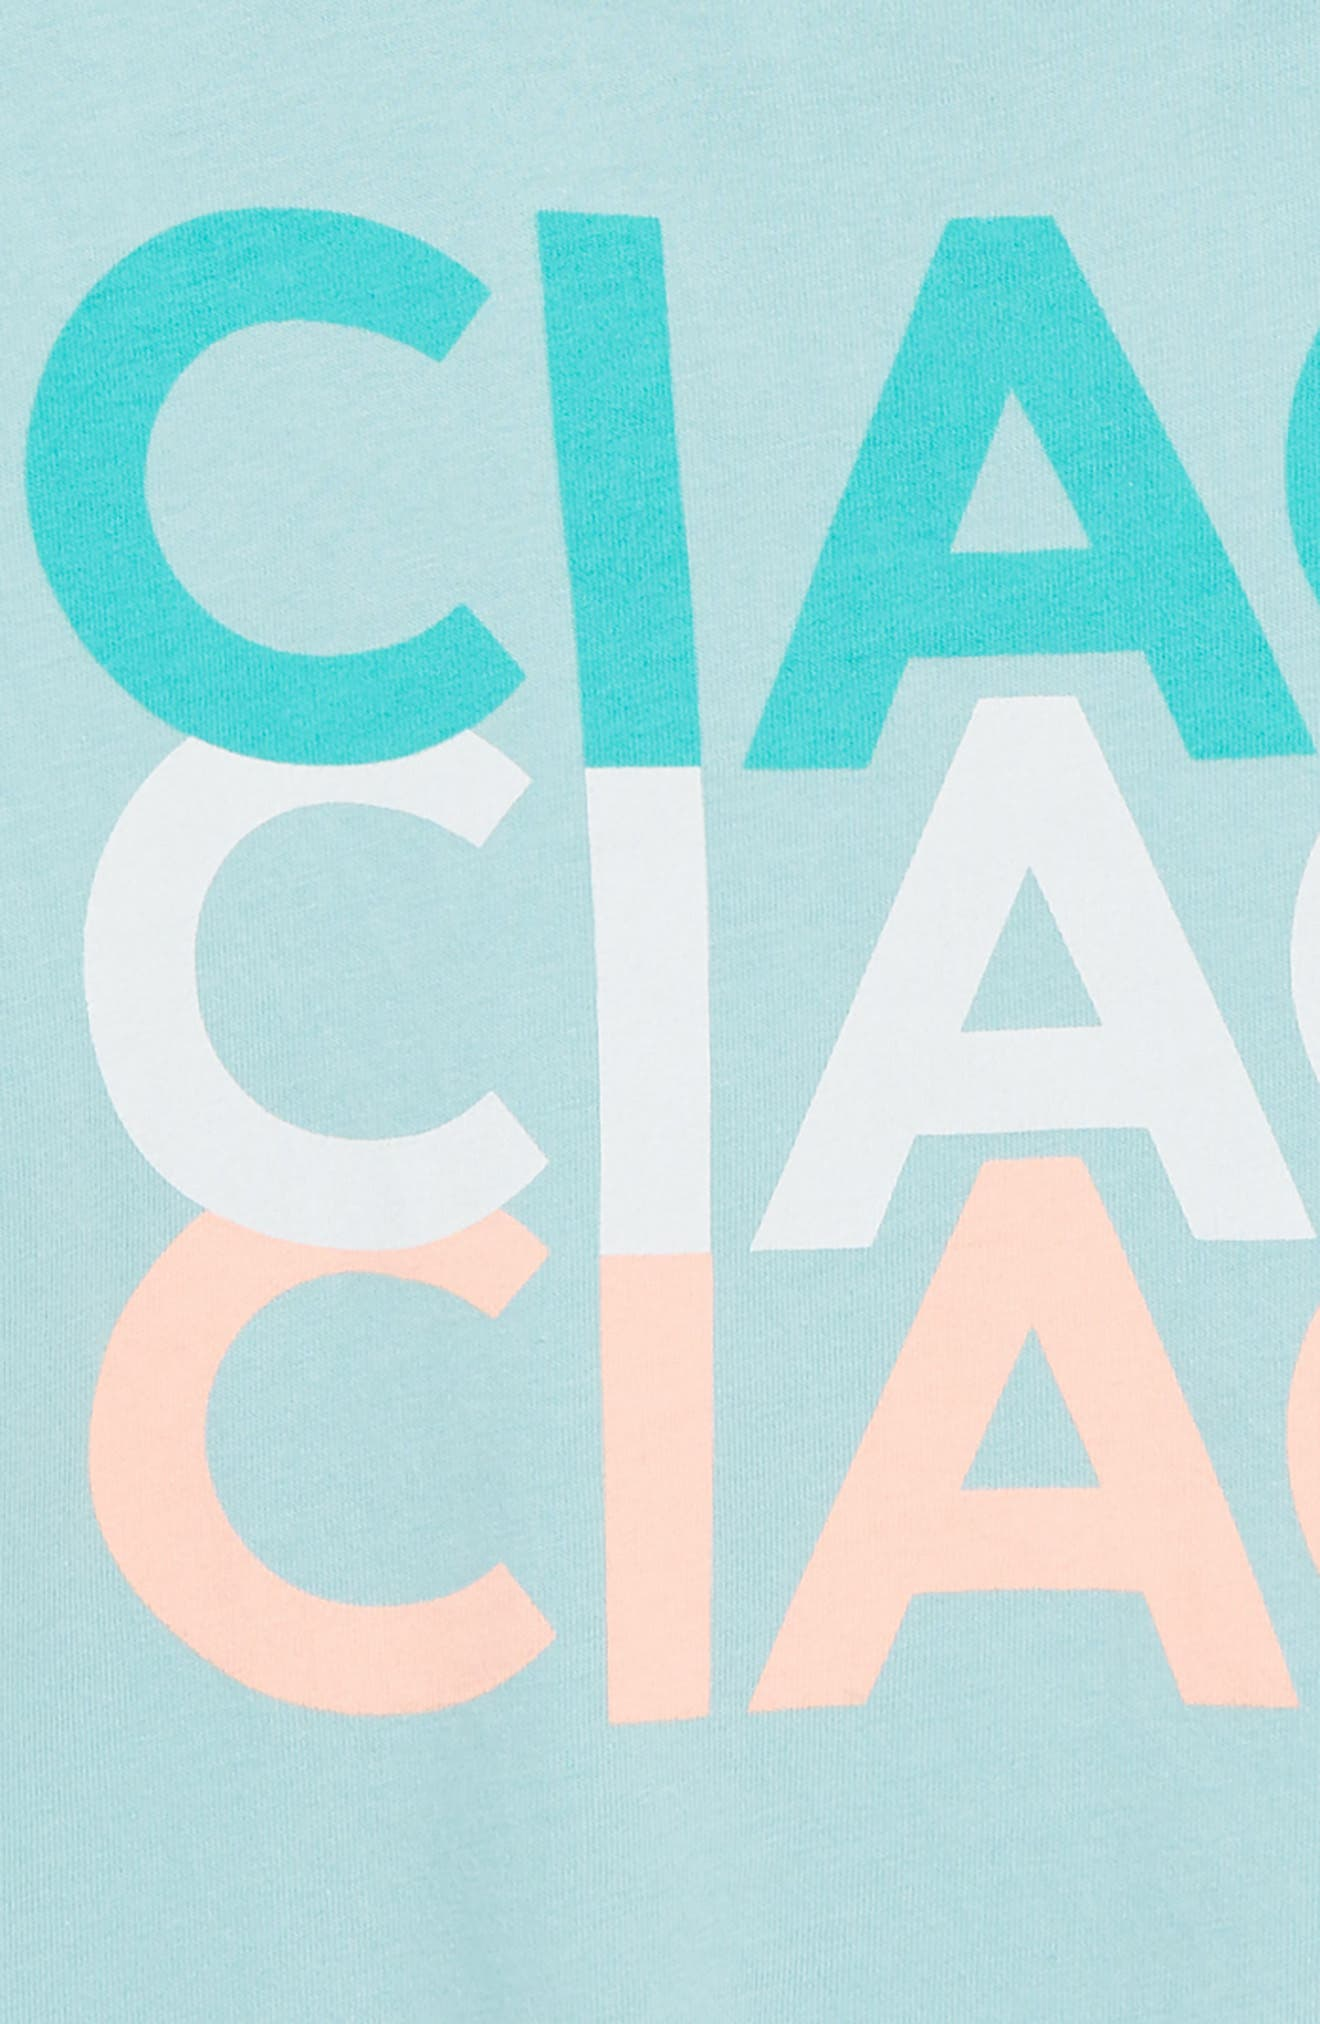 PEEK AREN'T YOU CURIOUS,                             Peek Ciao! T-Shirt,                             Alternate thumbnail 2, color,                             452